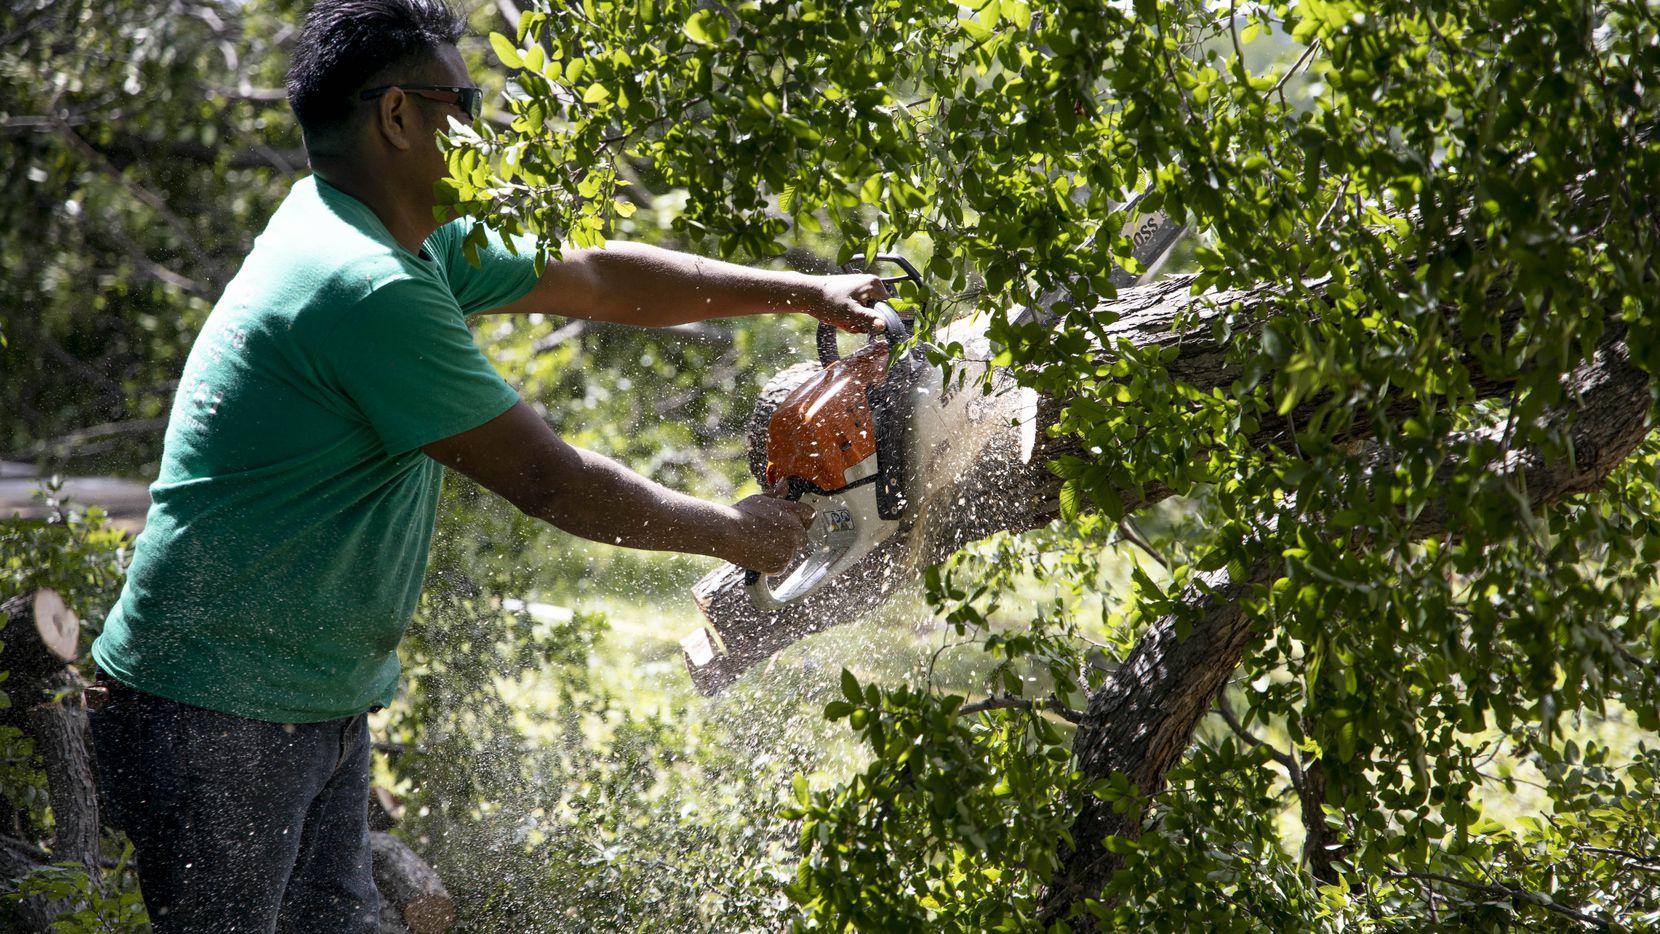 Bryan Benavides cuts down a tree from a yard near White Rock Lake in Dallas.